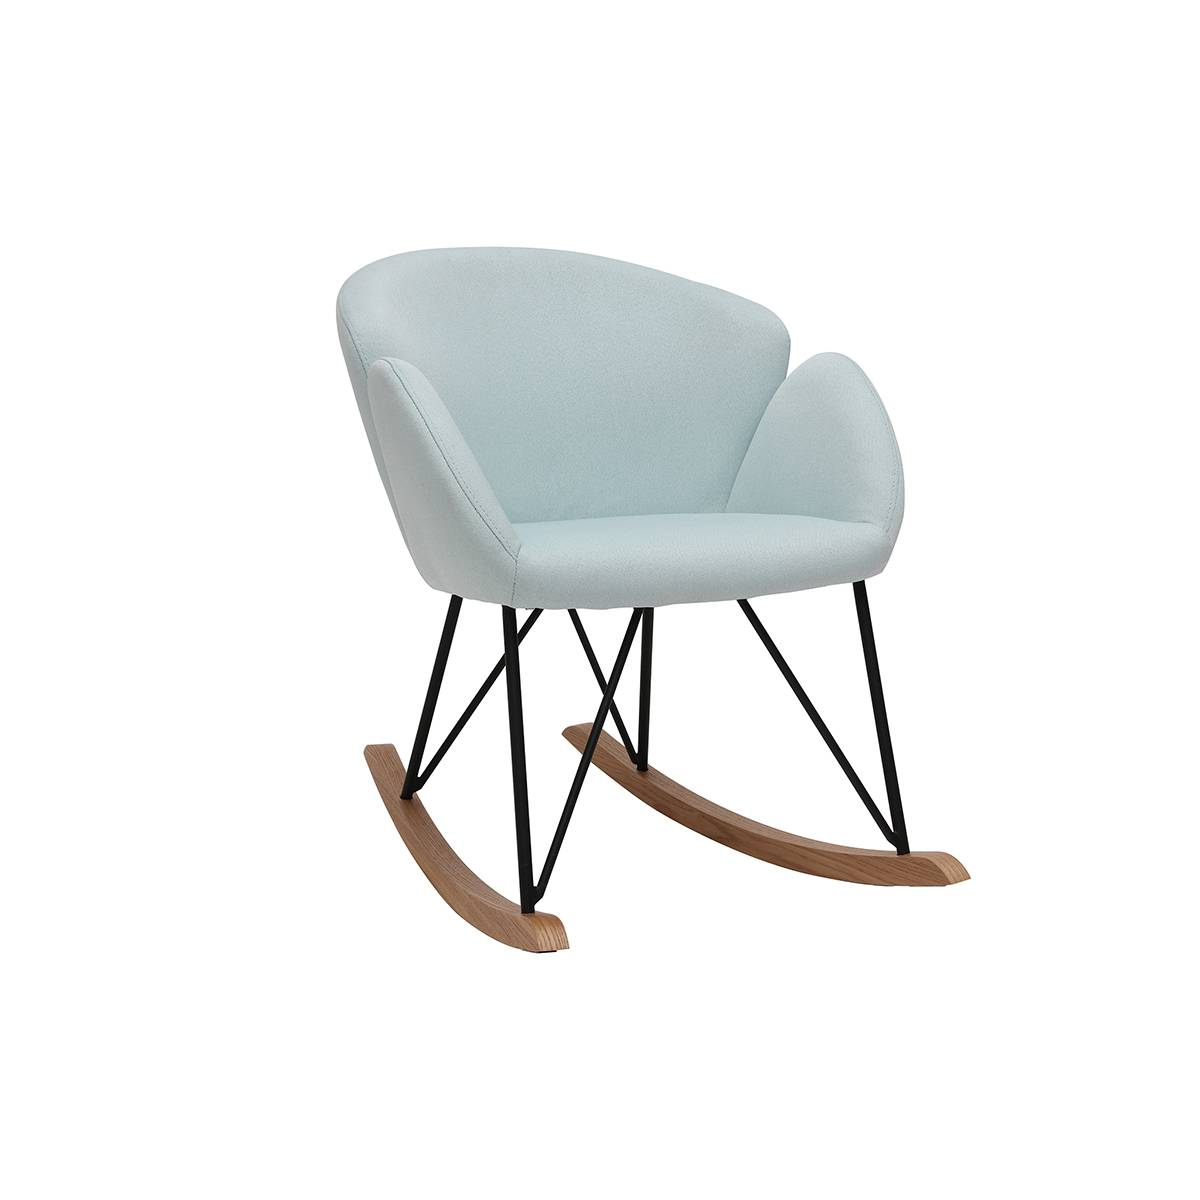 Miliboo Rocking chair design tissu menthe à l'eau RHAPSODY - Miliboo & Stéphane Plaza